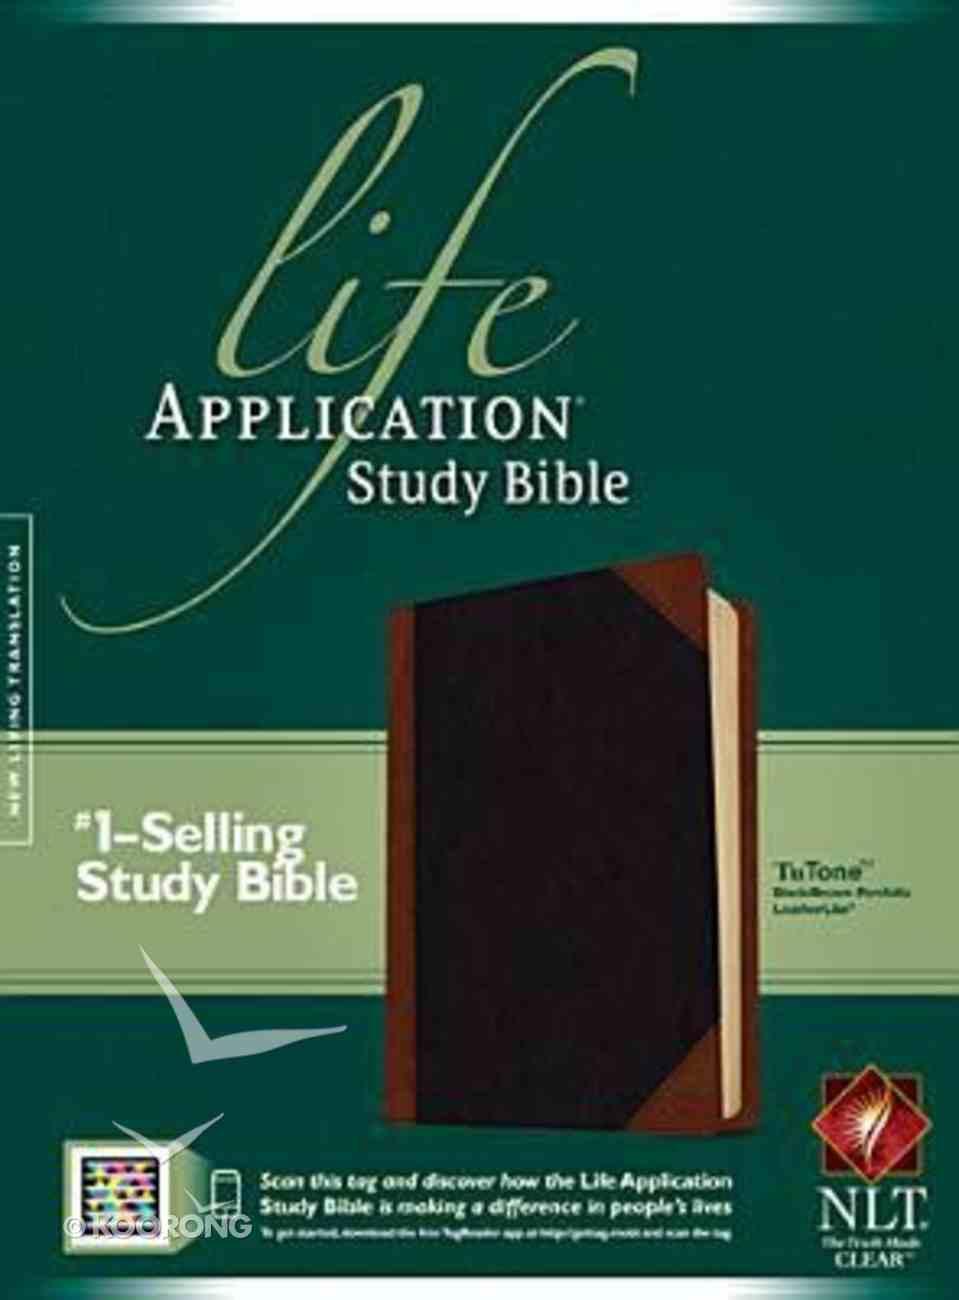 NLT Life Application Study Bible Tutone Black/Brown Imitation Leather